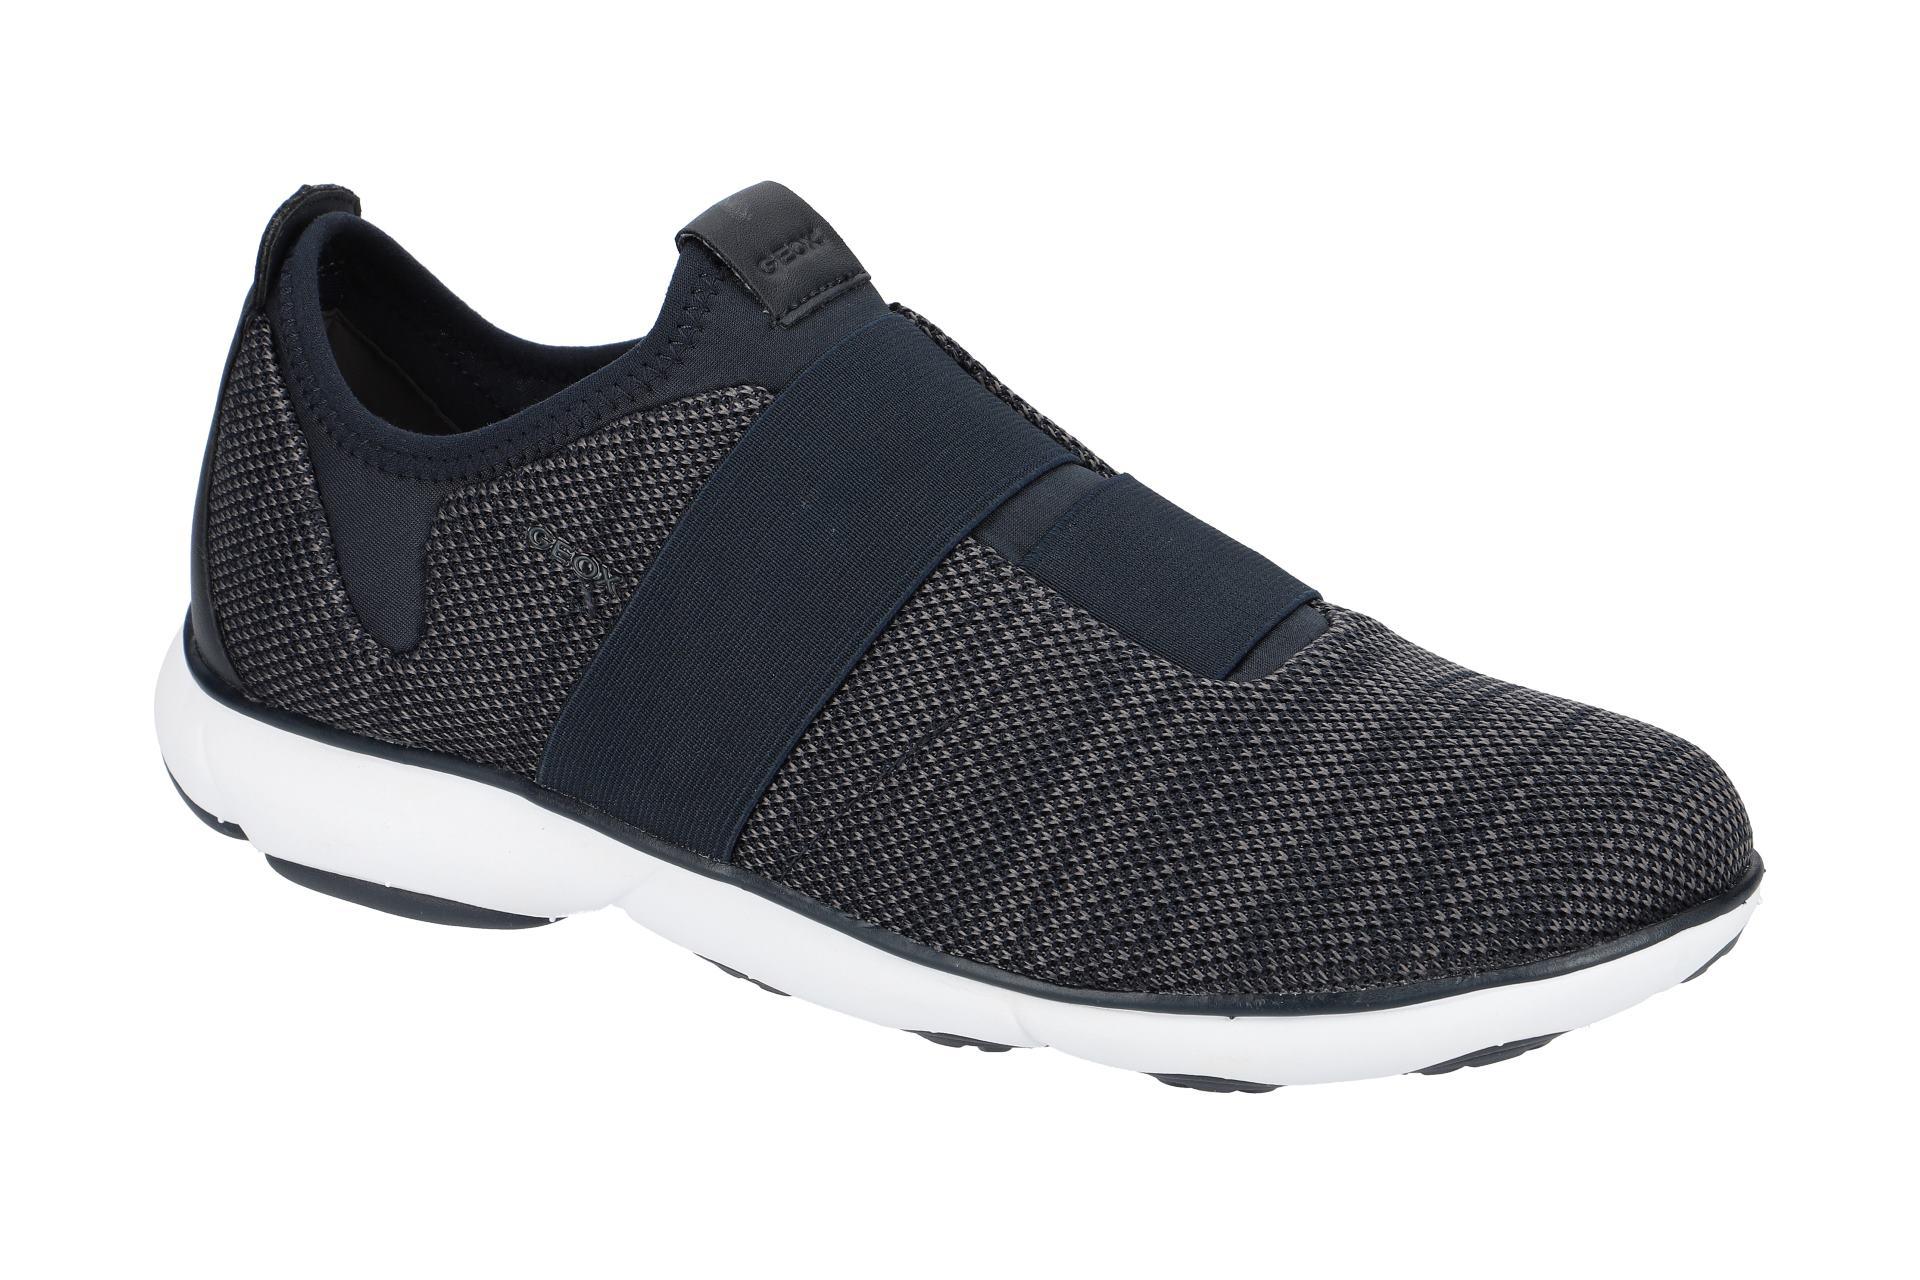 Geox Schuhe NEBULA blau Herrenschuhe sportliche Slipper